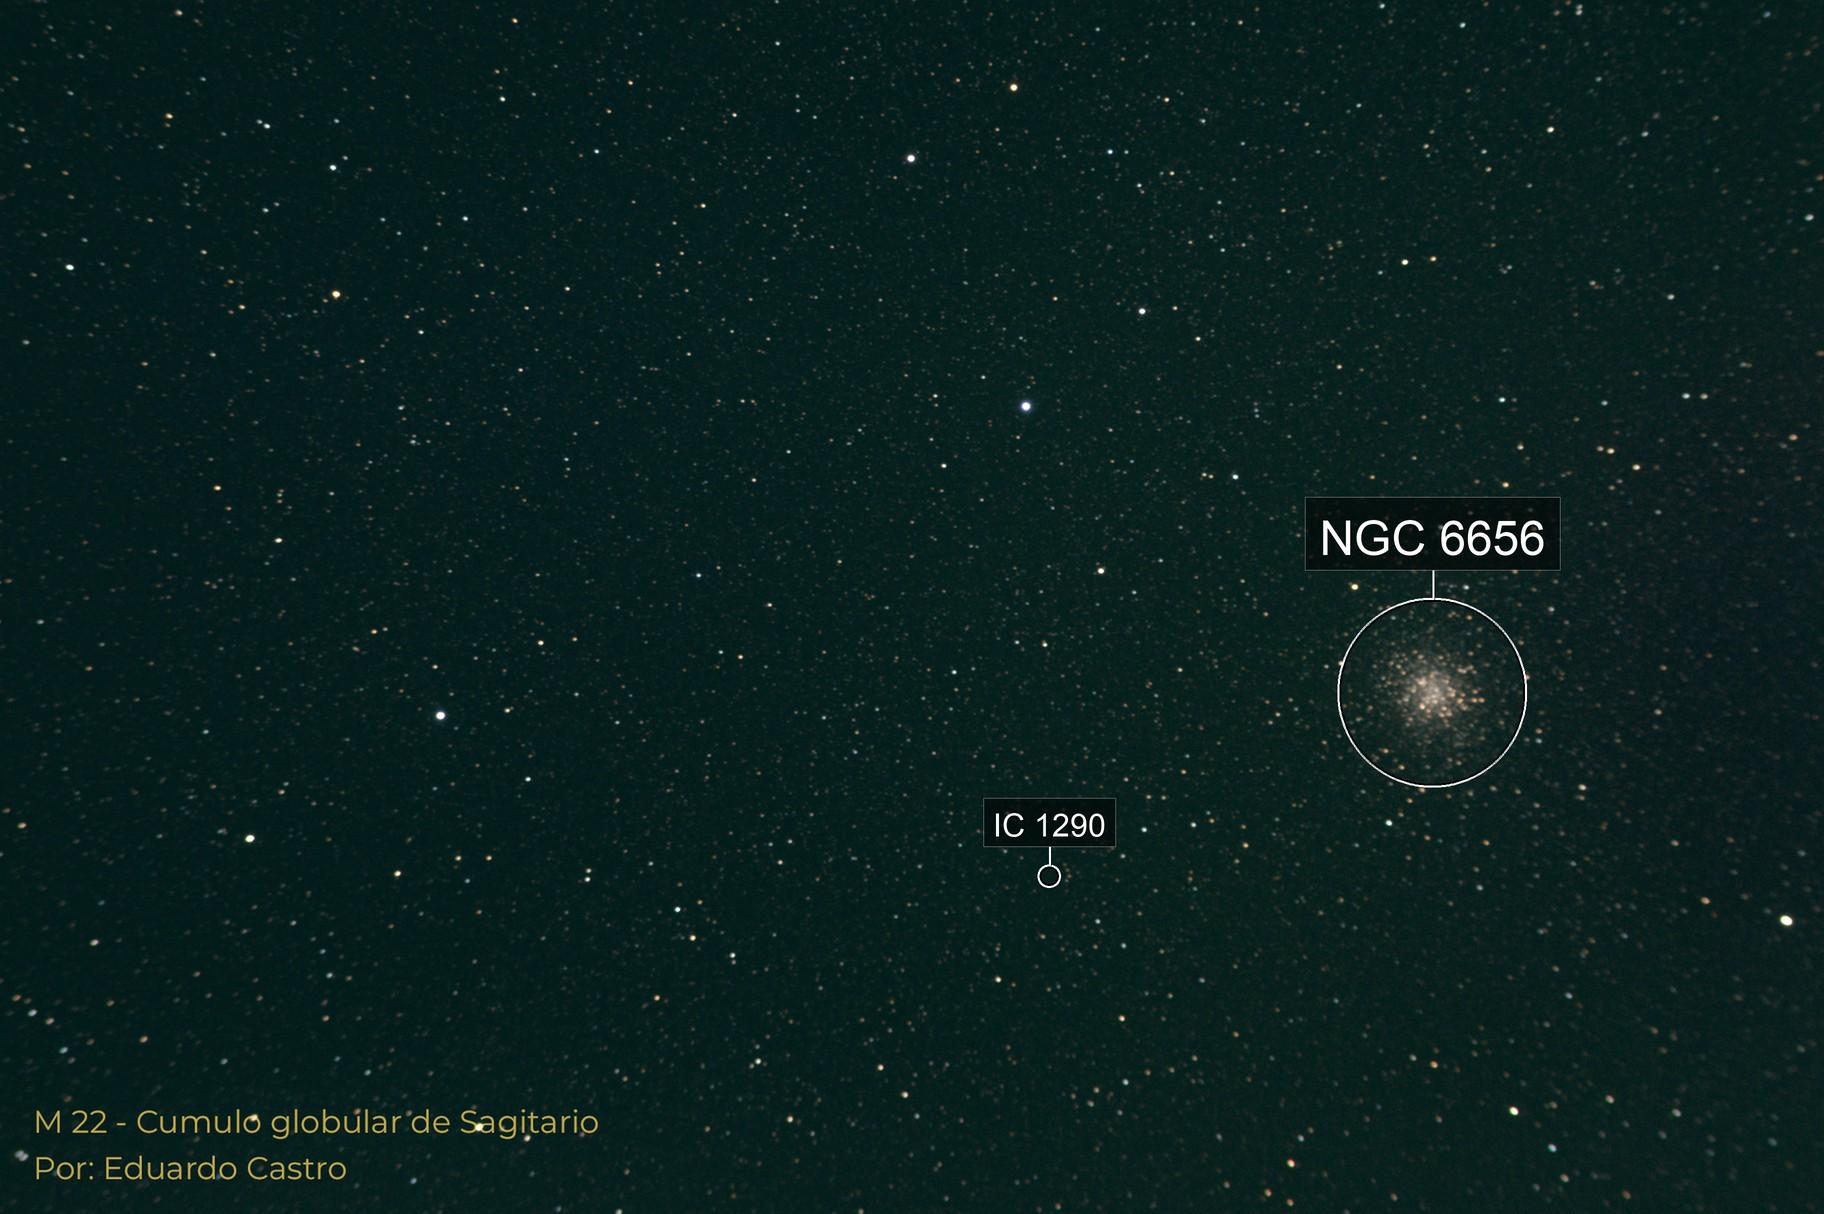 M22 - Sagittarius globular cluster